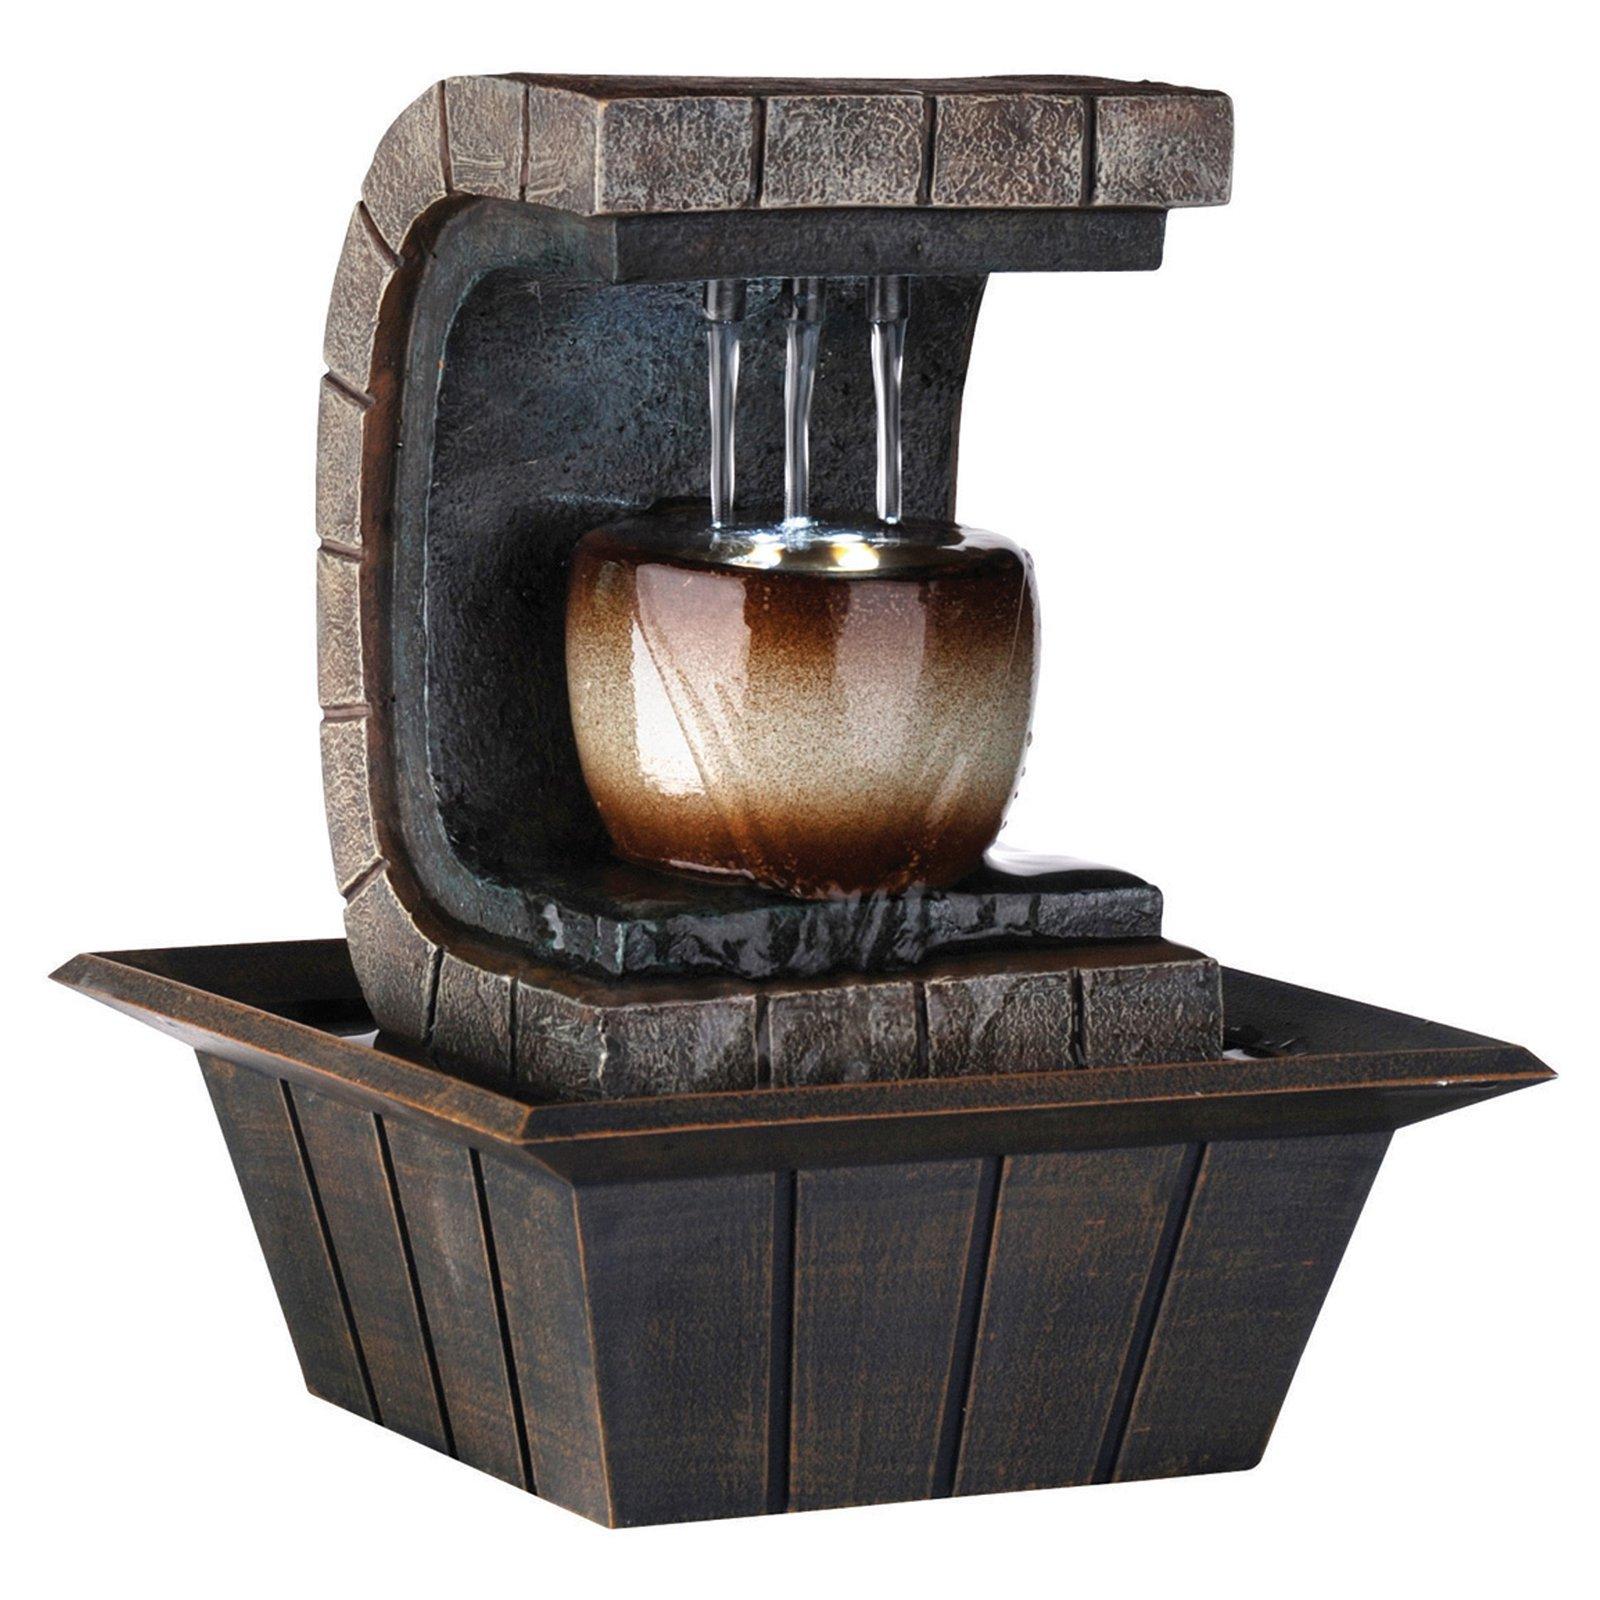 "ORE International 9.75"" Meditation Fountain with LED Light"